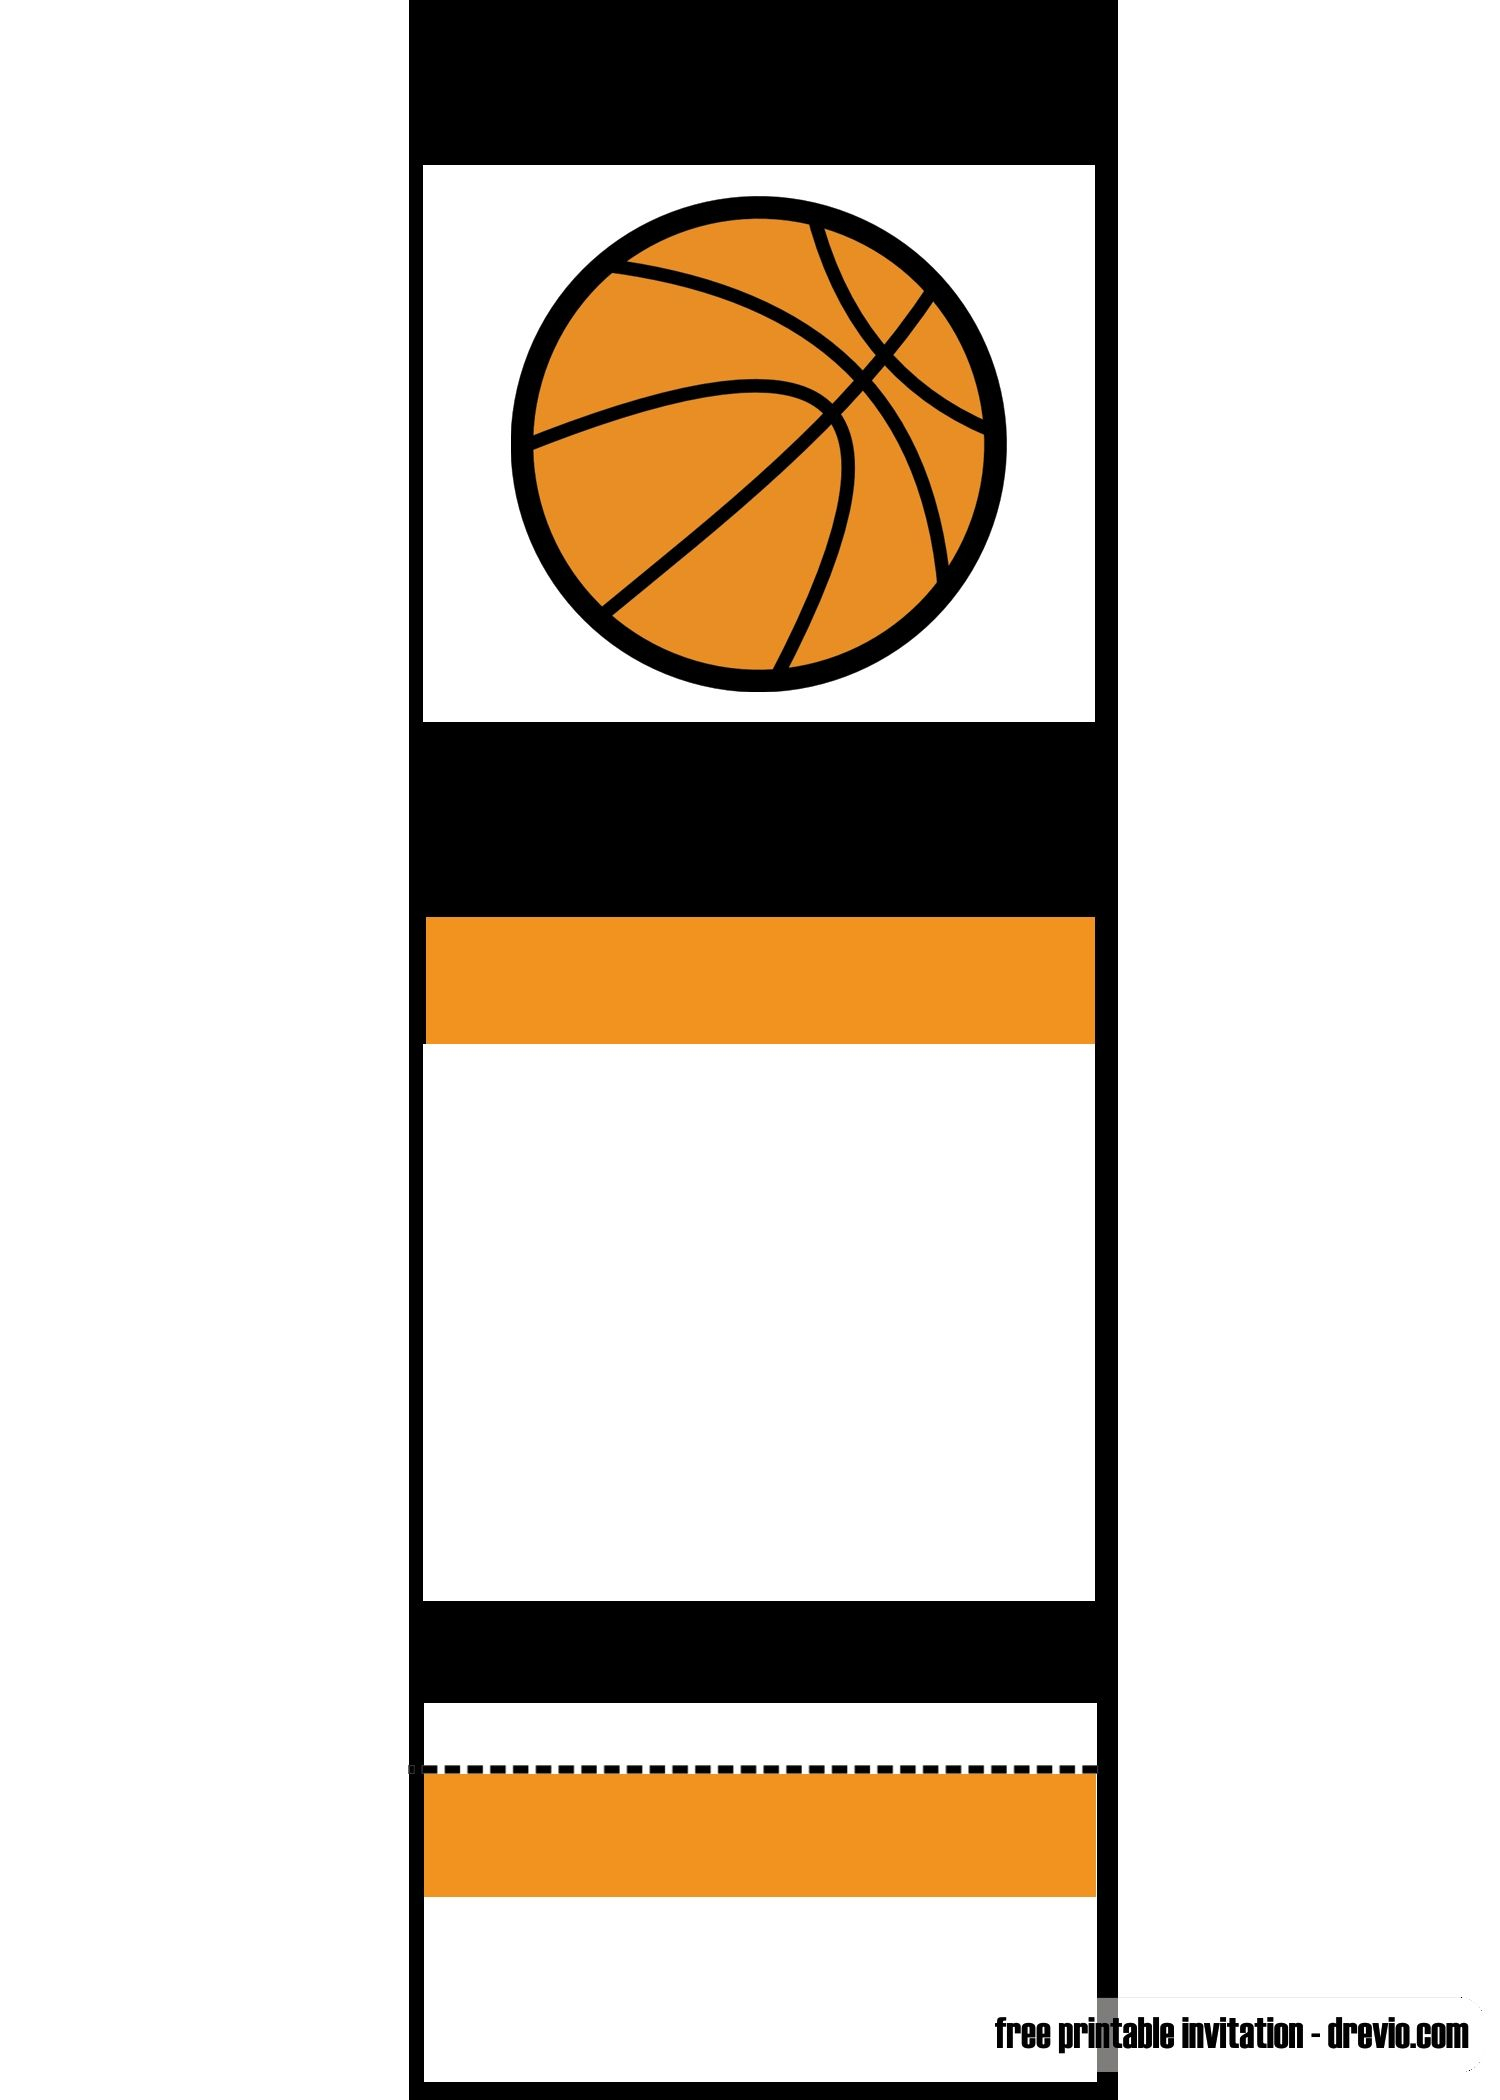 Free Printable Basketball Ticket Invitation | Unc Vs Gonzaga - Free Printable Basketball Cards